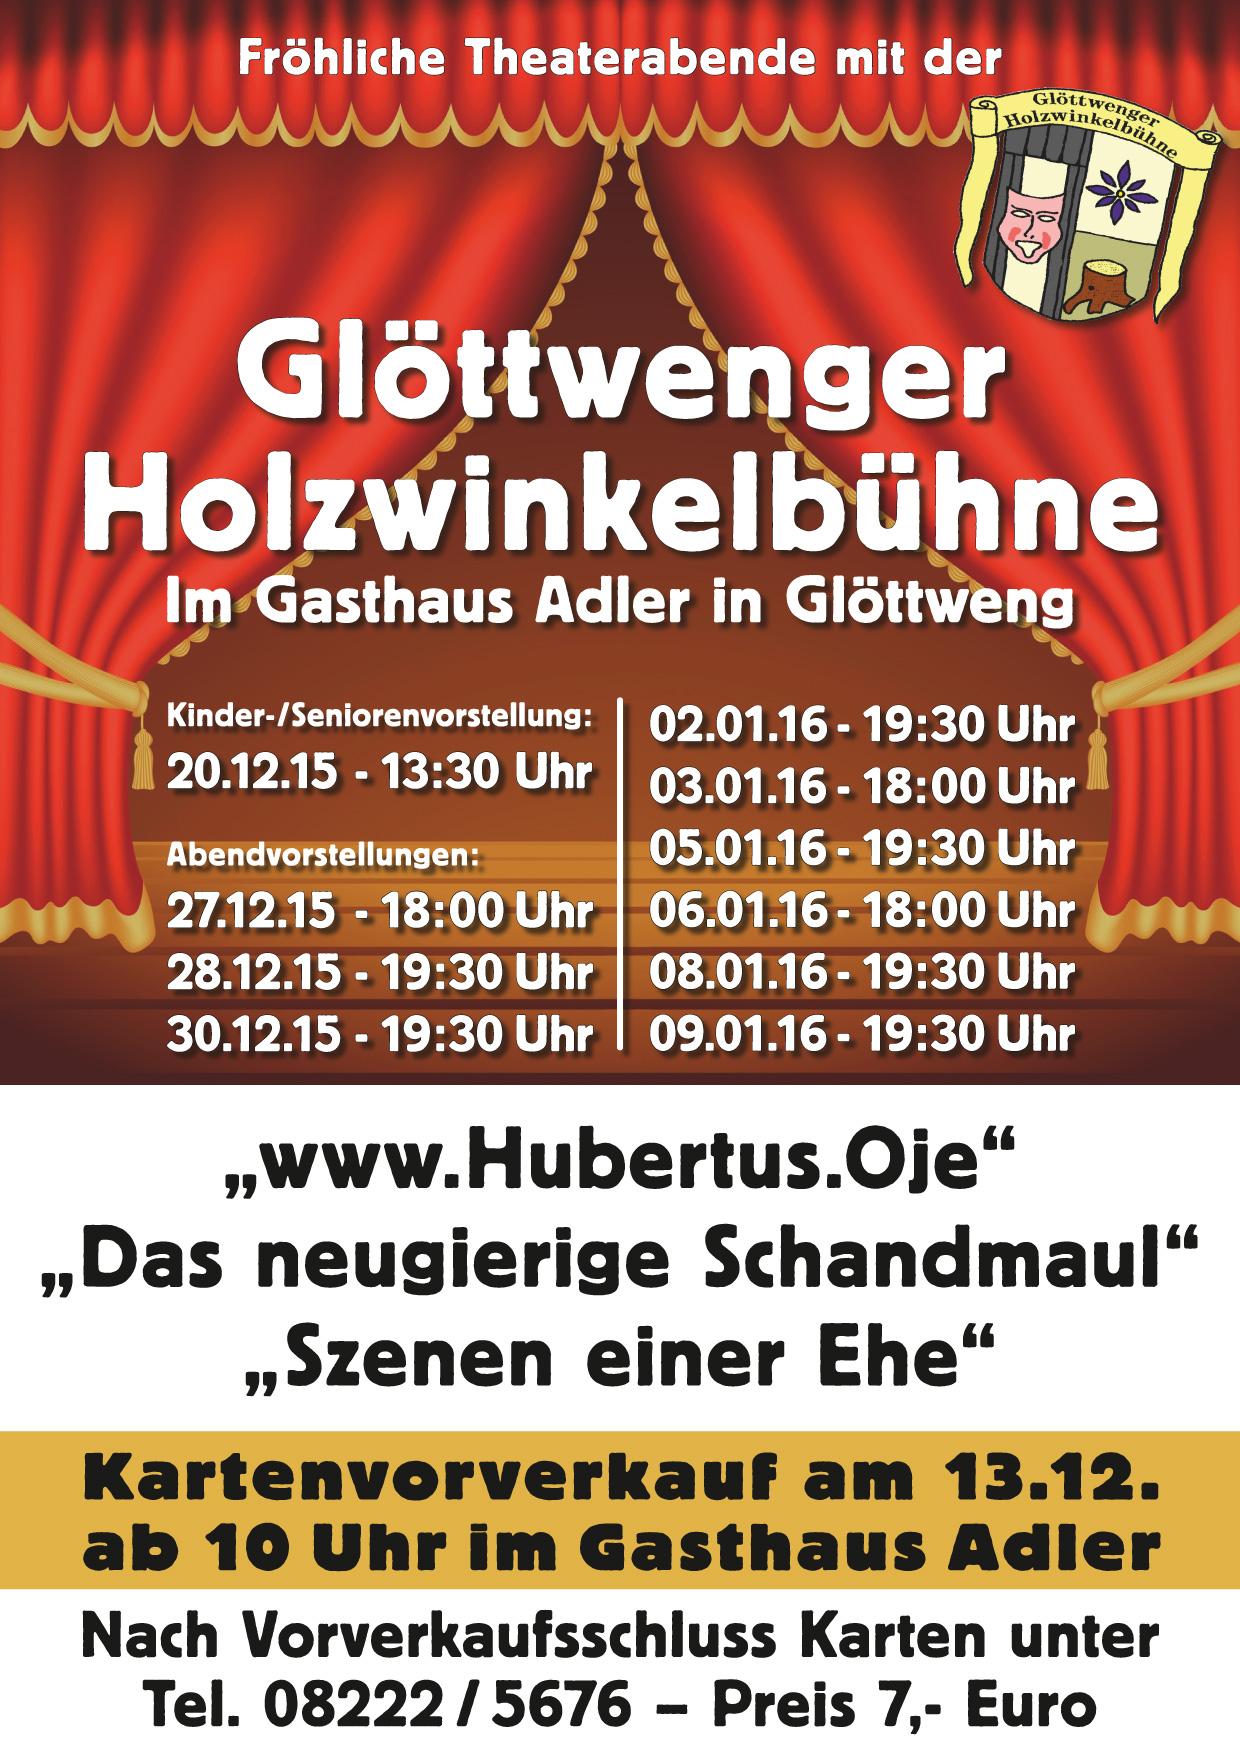 holzwinkelbuehne_theater